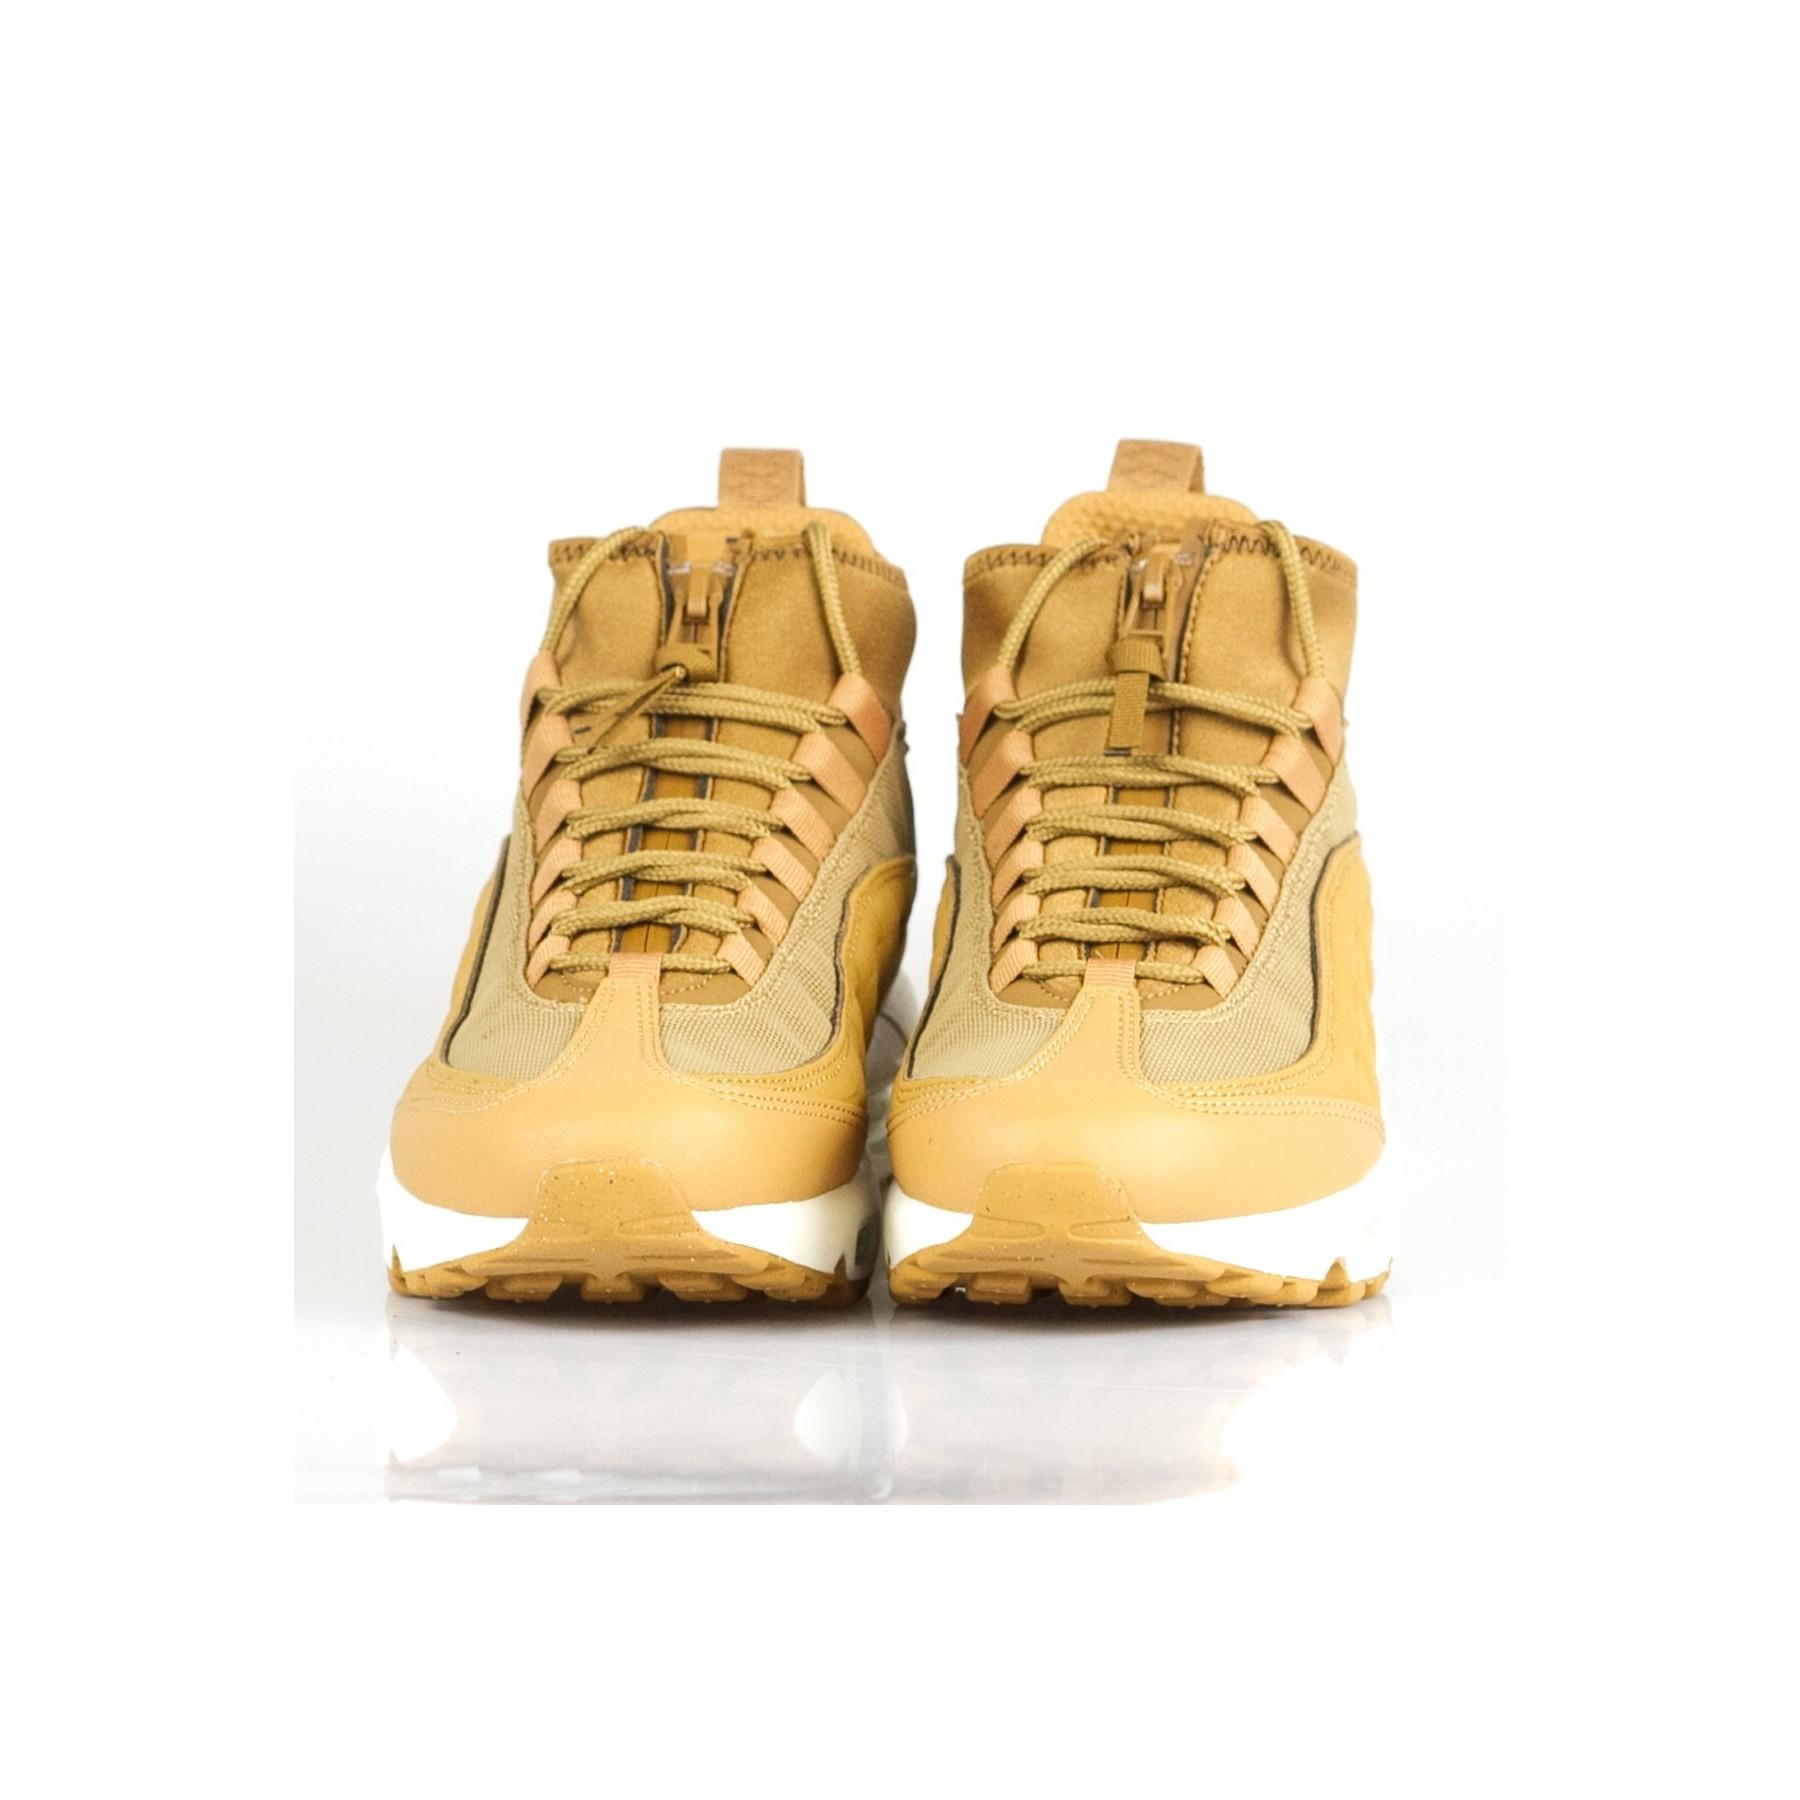 scarpa alta uomo air max 95 sneakerboot FLAX/FLAX/ALE BROWN/SAIL